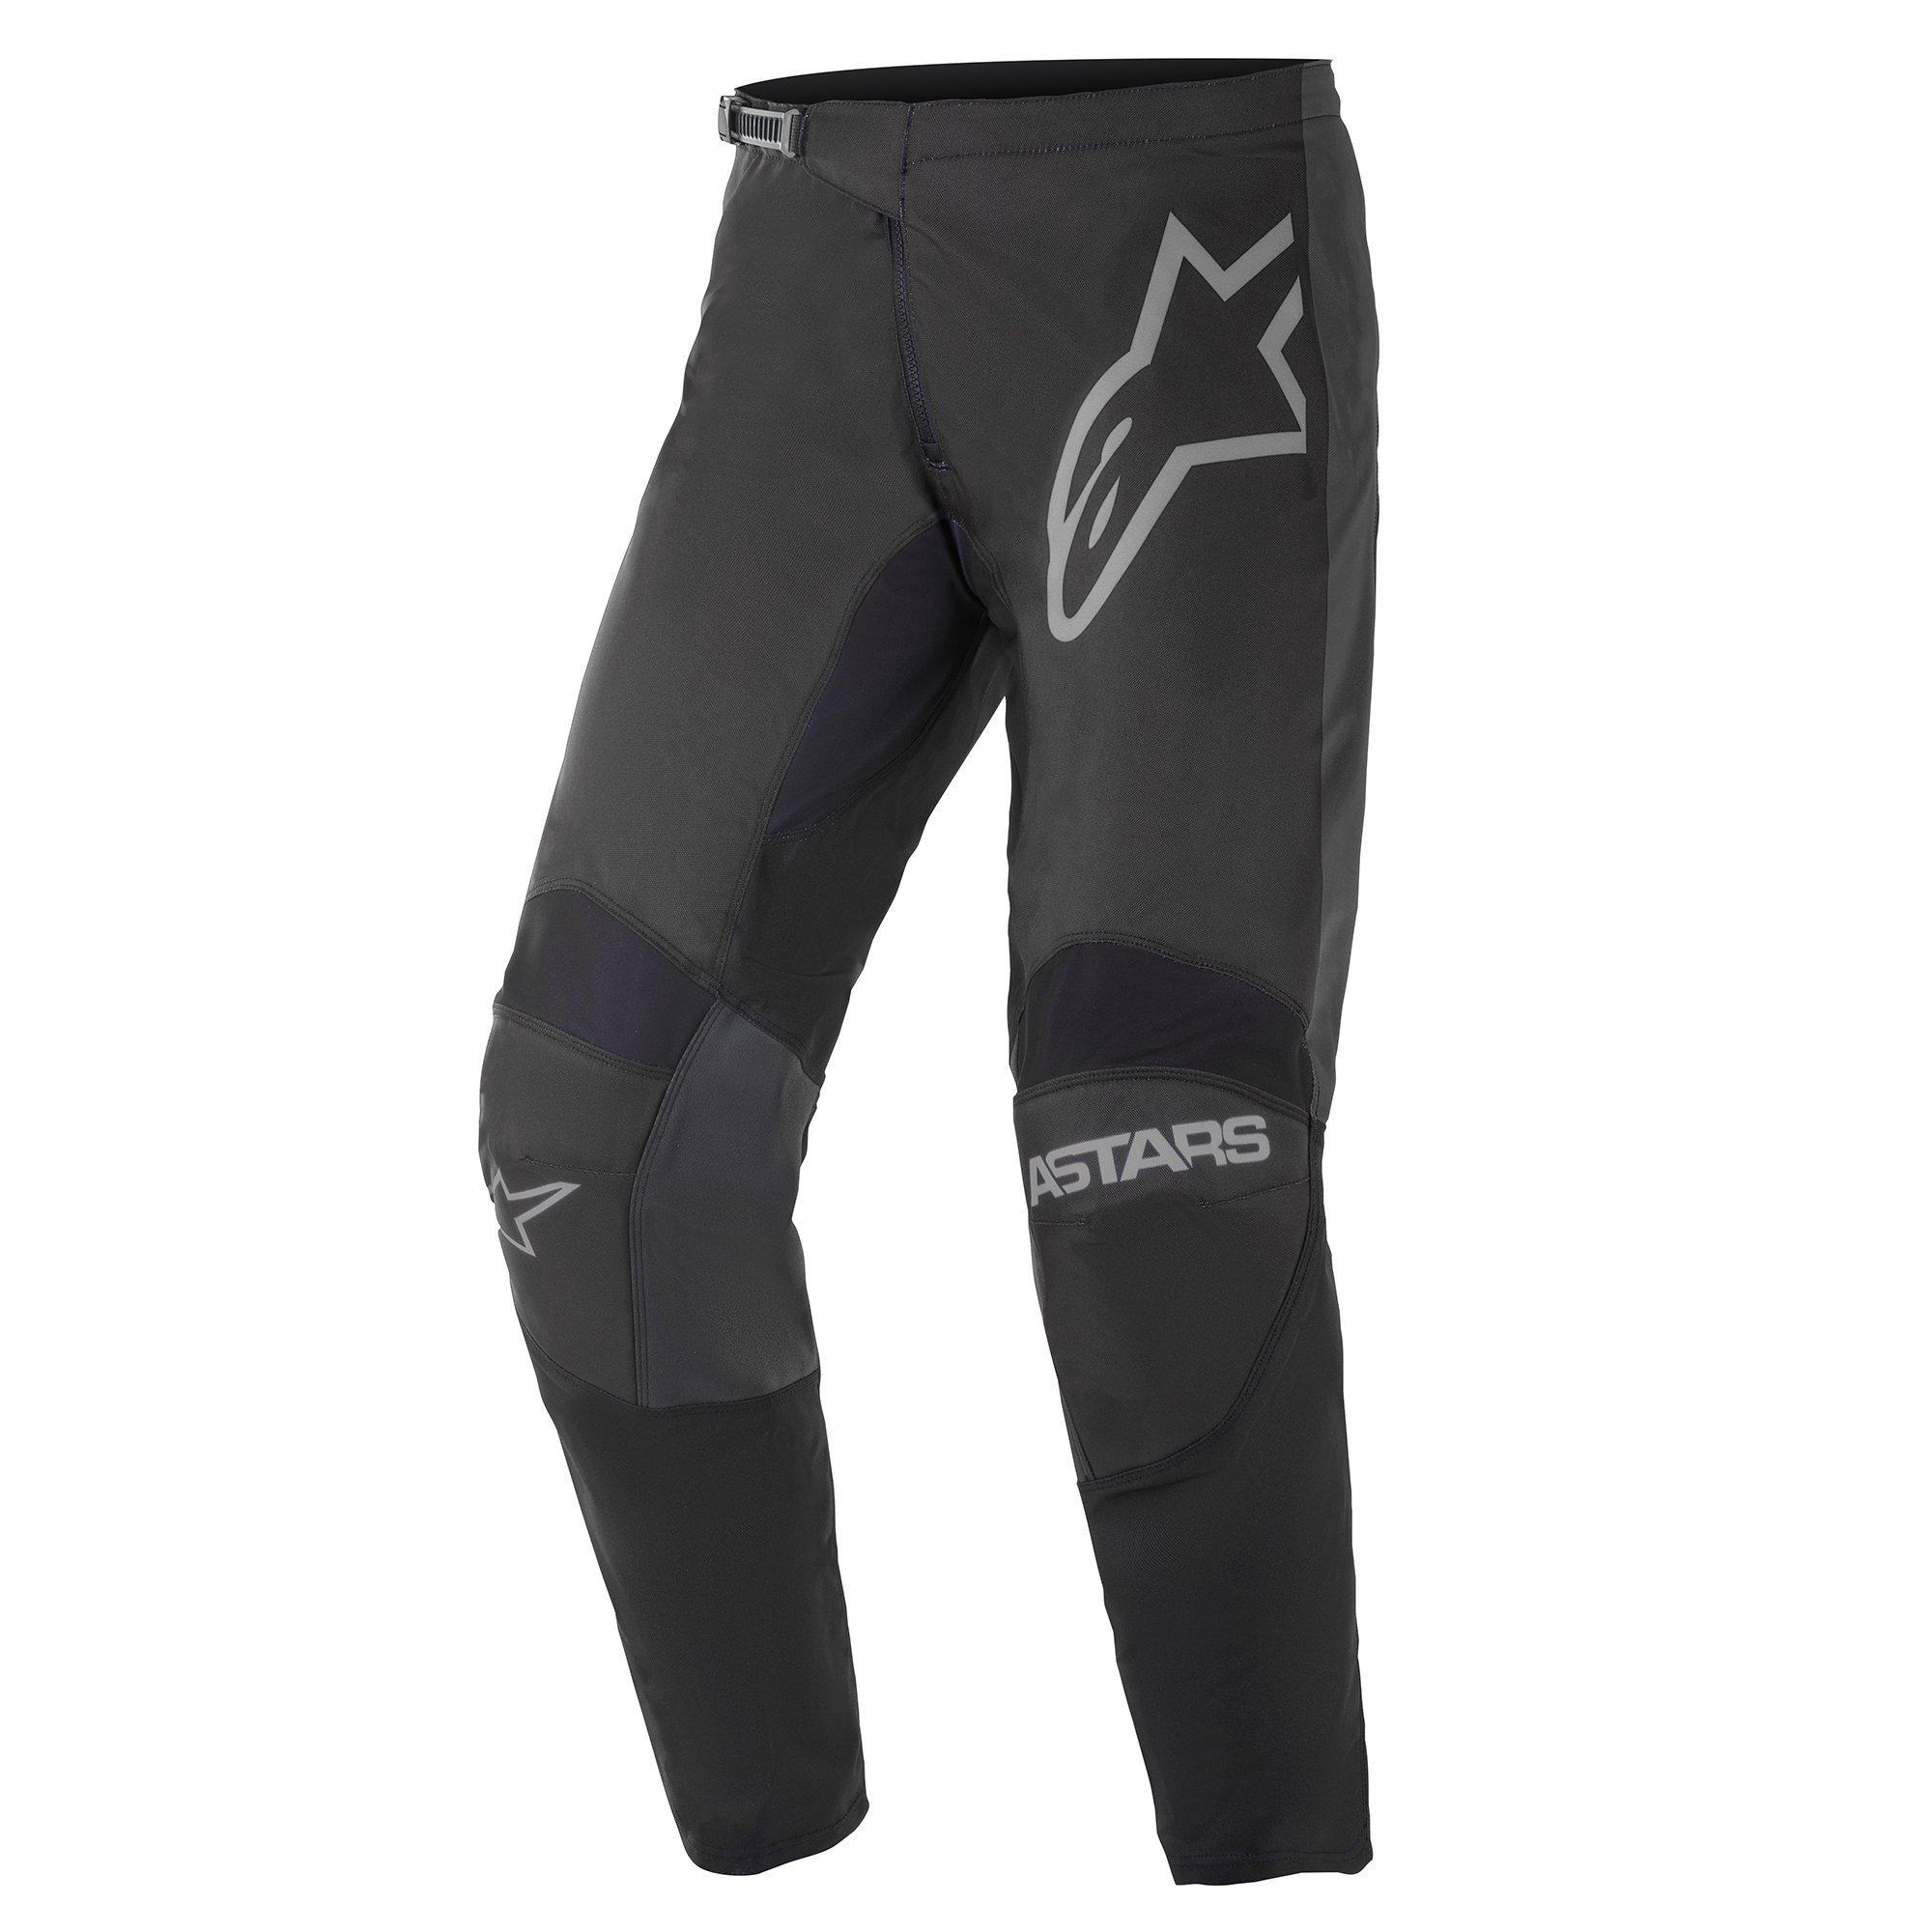 Alpinestars 2021 Fluid Graphite Black/Dark Grey Pants